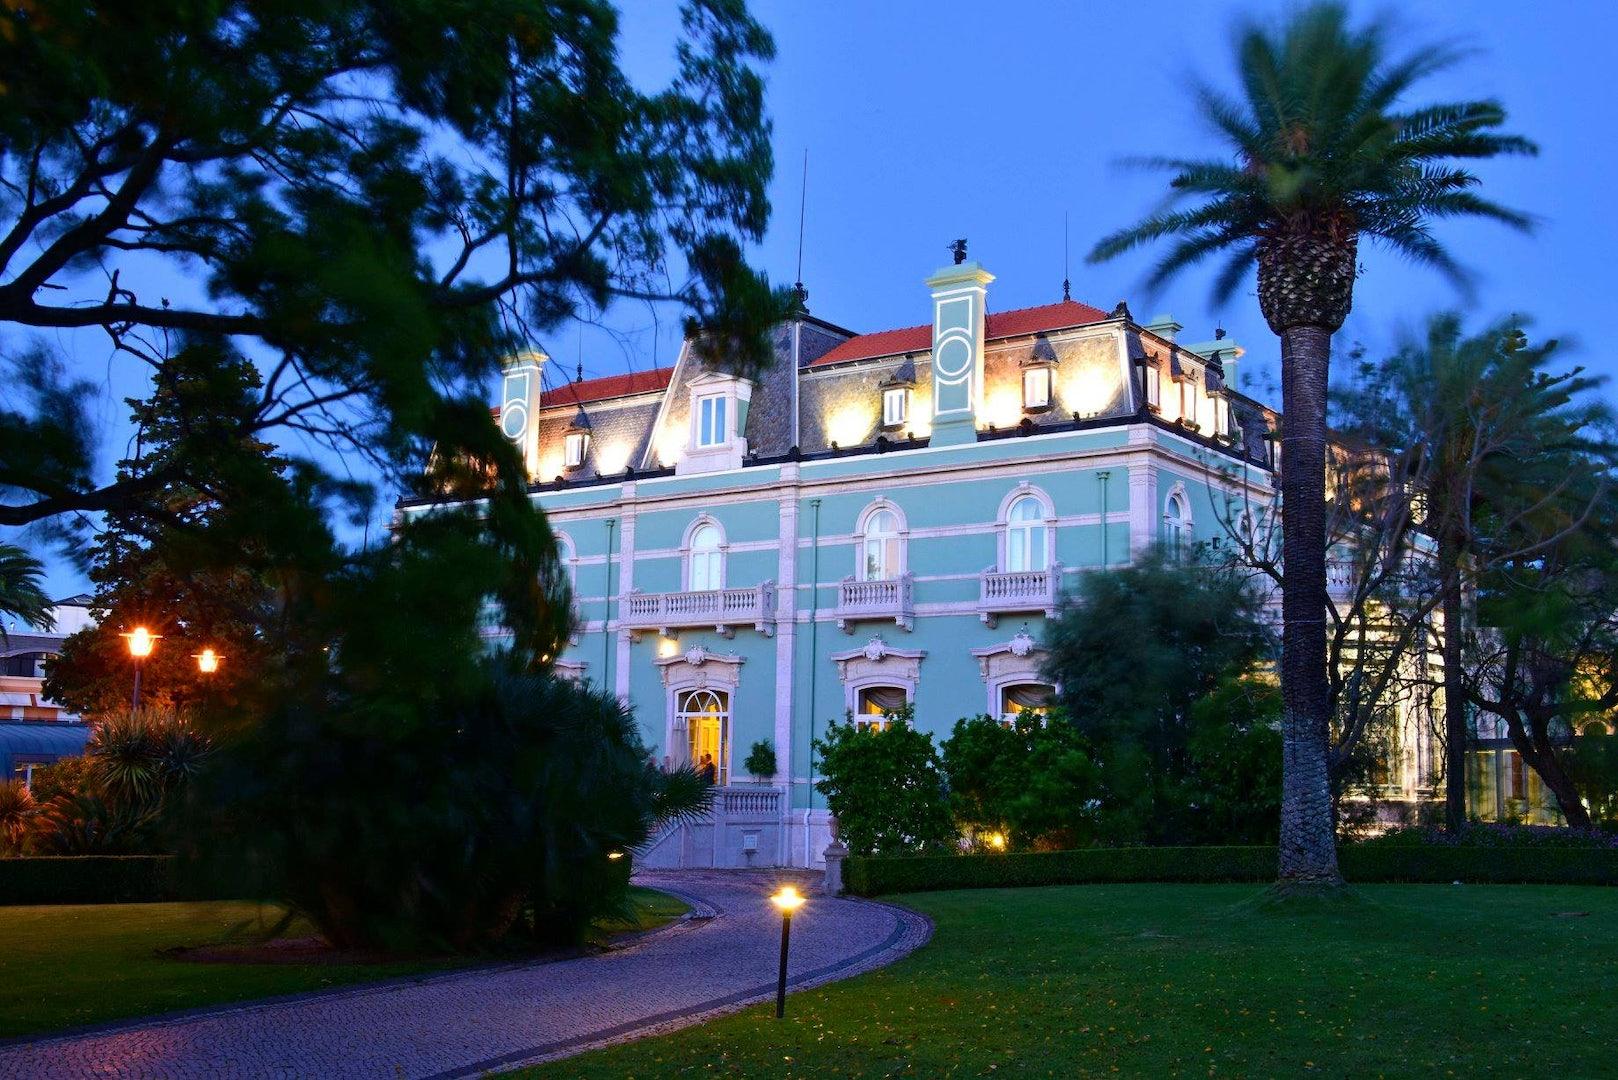 garden and bright blue exterior of the Pestana Palace